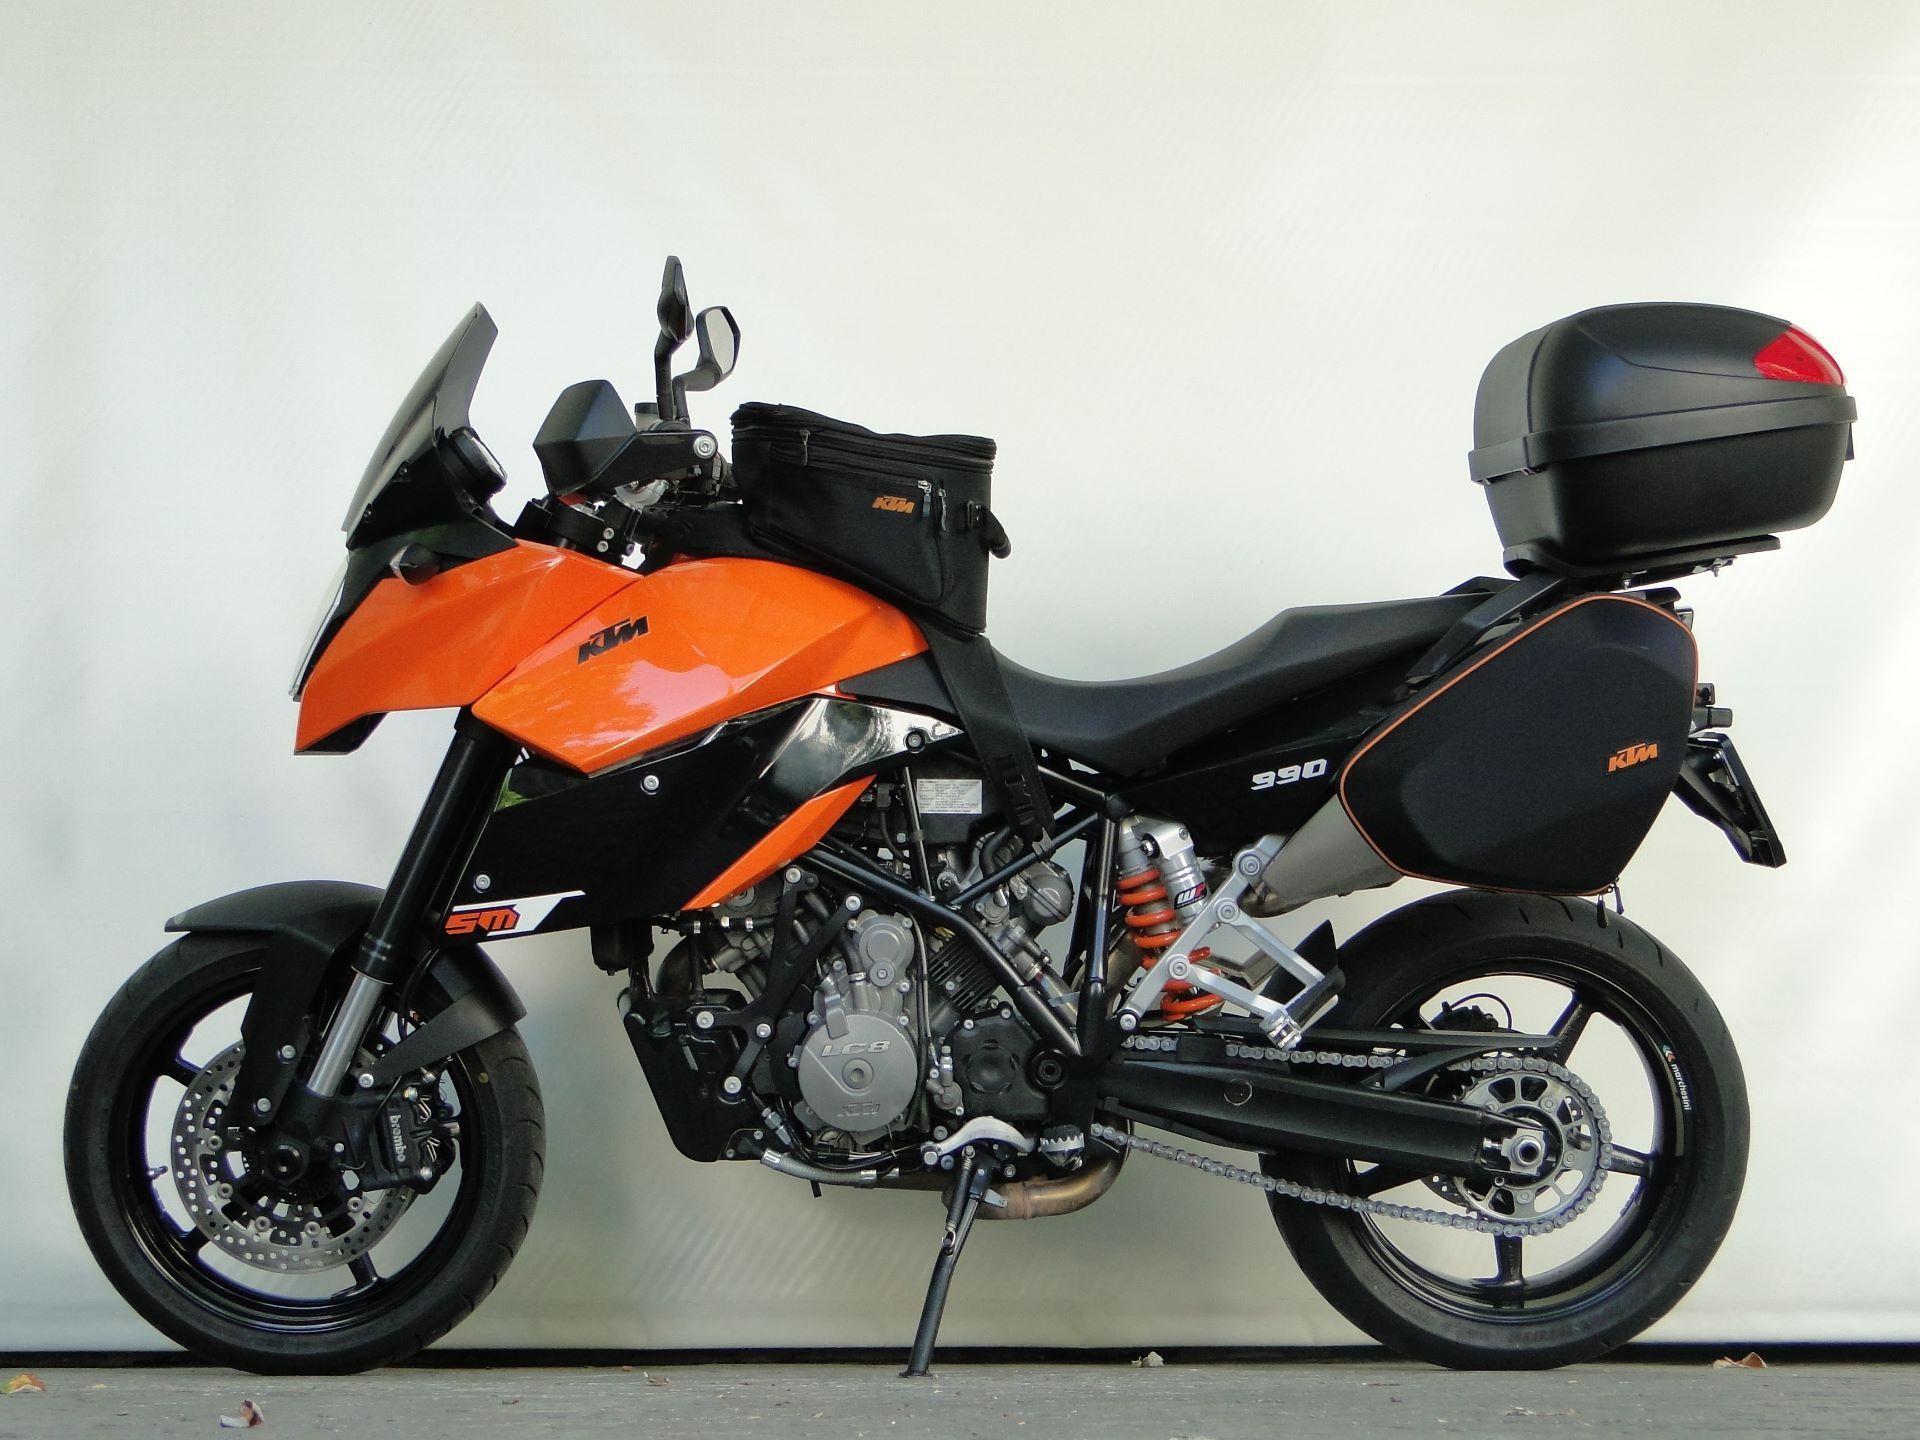 moto occasioni acquistare ktm 990 supermoto t hobi moto ag winterthur. Black Bedroom Furniture Sets. Home Design Ideas